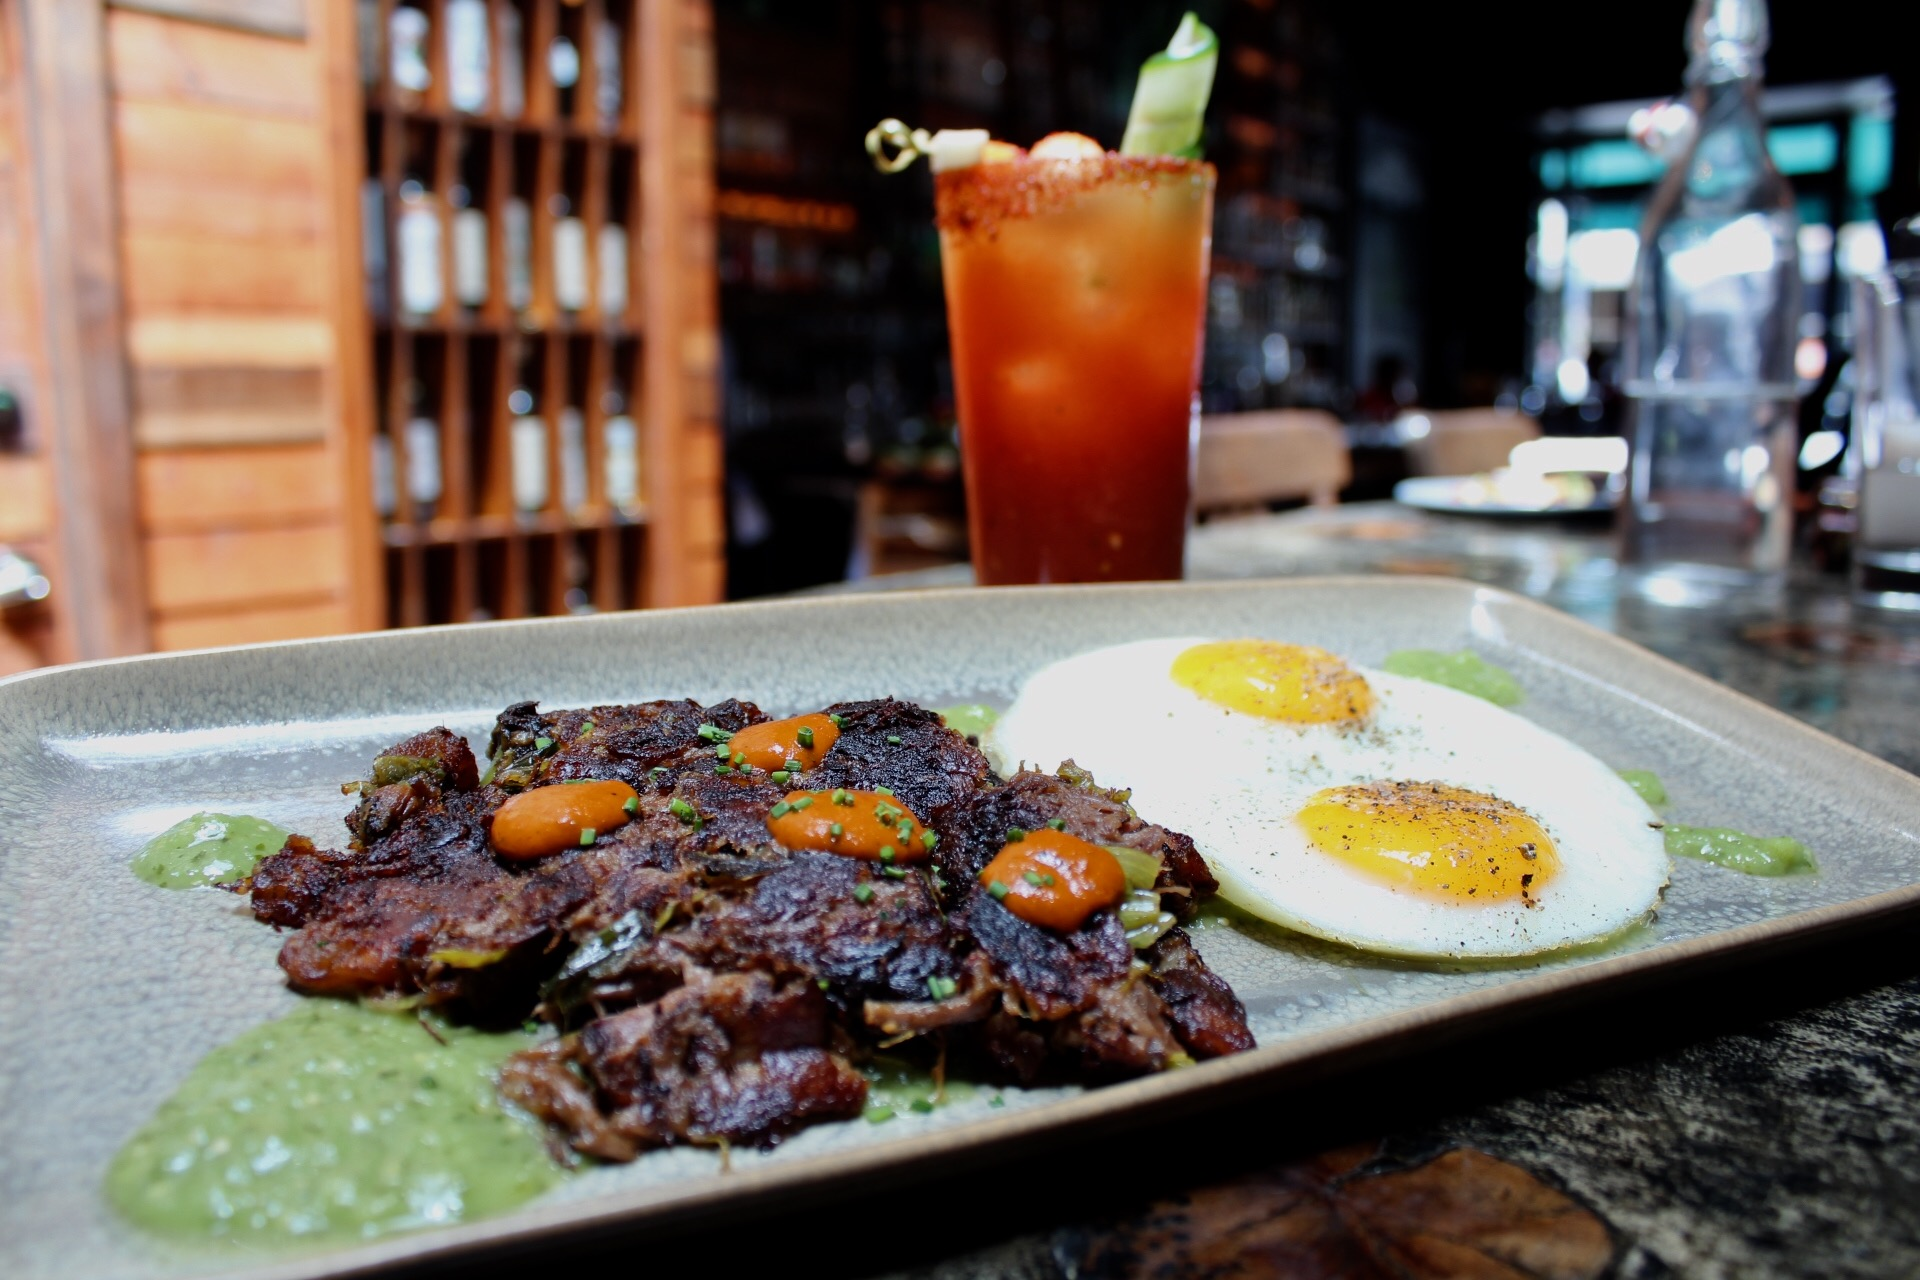 Mezcalito breakfast dish